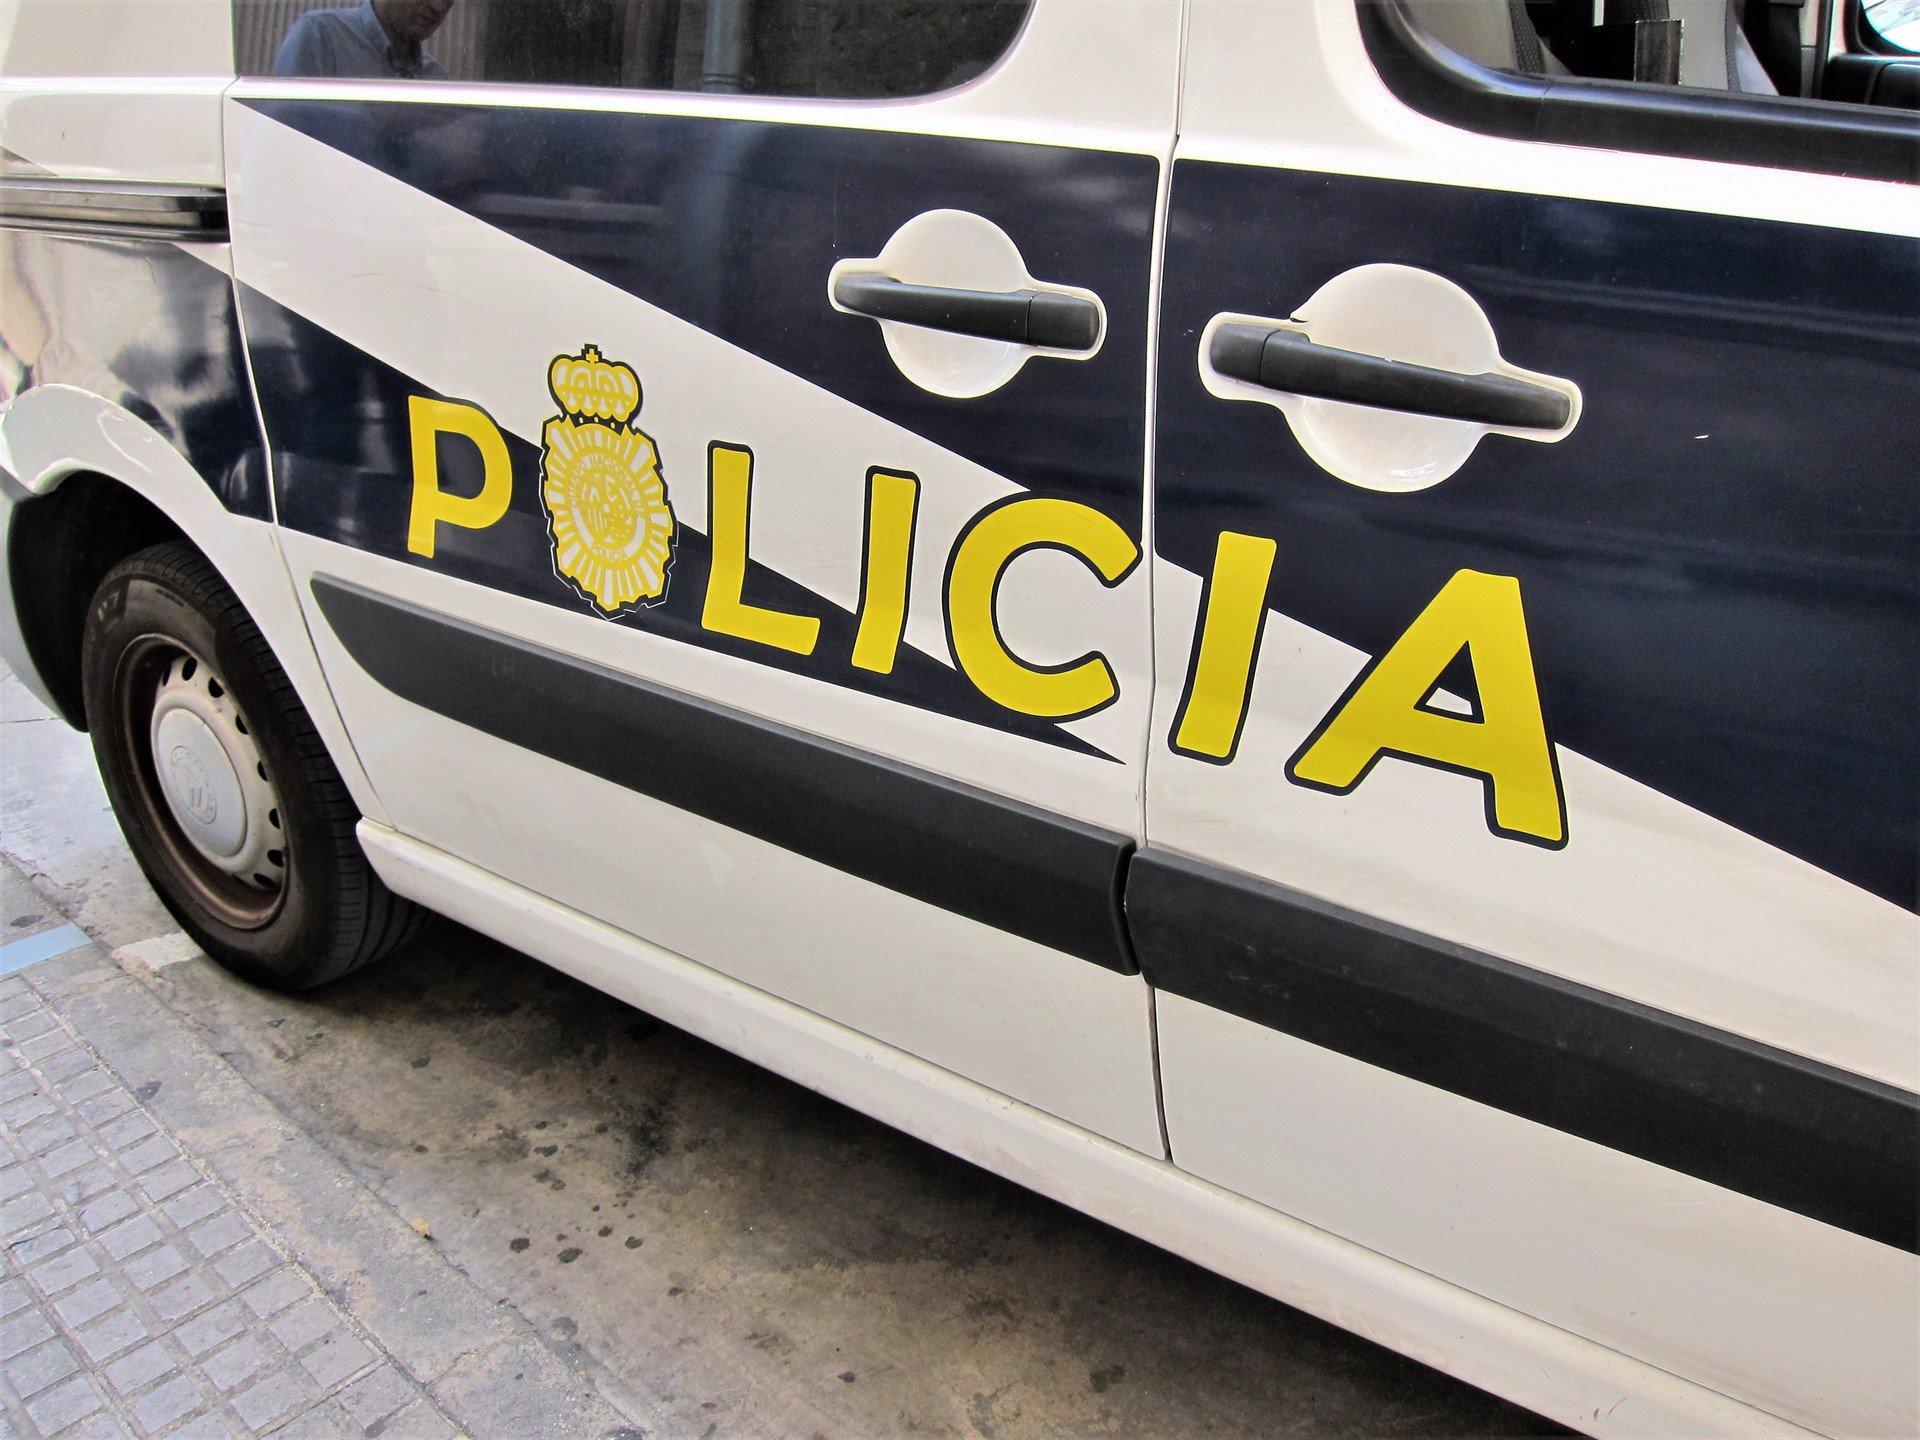 https://img.europapress.es/fotoweb/fotonoticia_20180713104235_1920.jpg